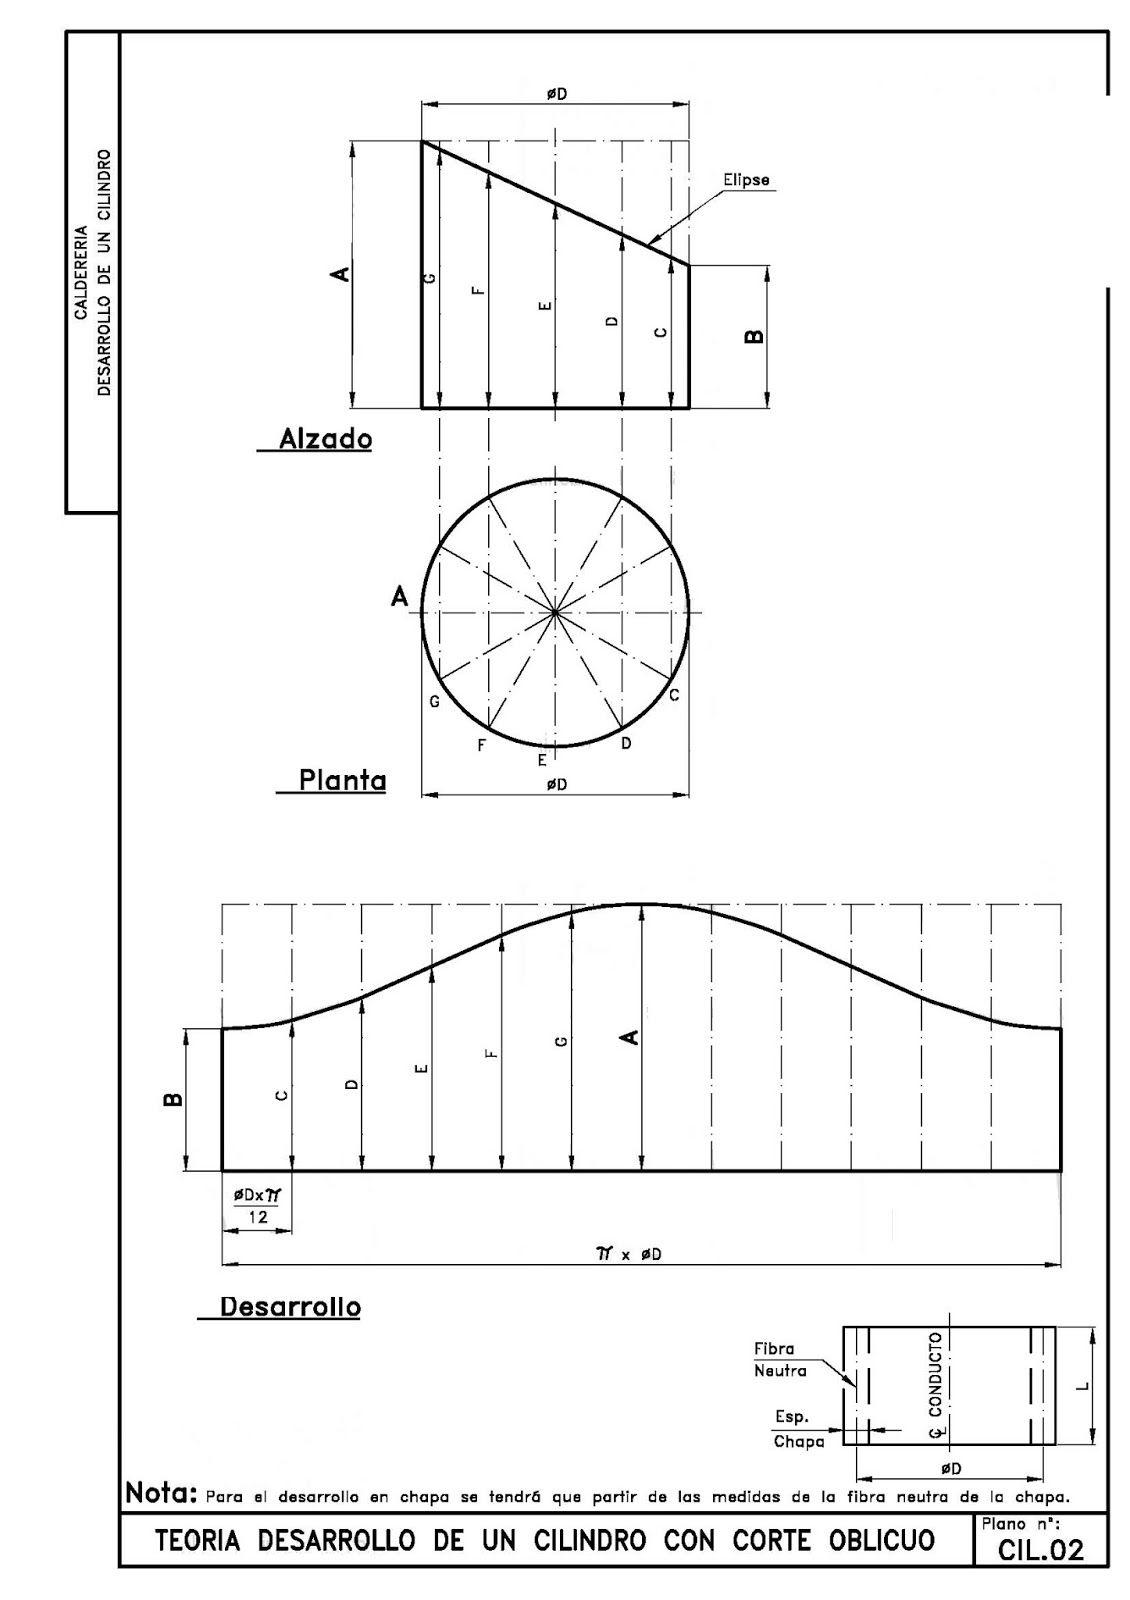 Pin De Raul Astelli En Jairo Caldereria Geometría Descriptiva Técnicas De Dibujo